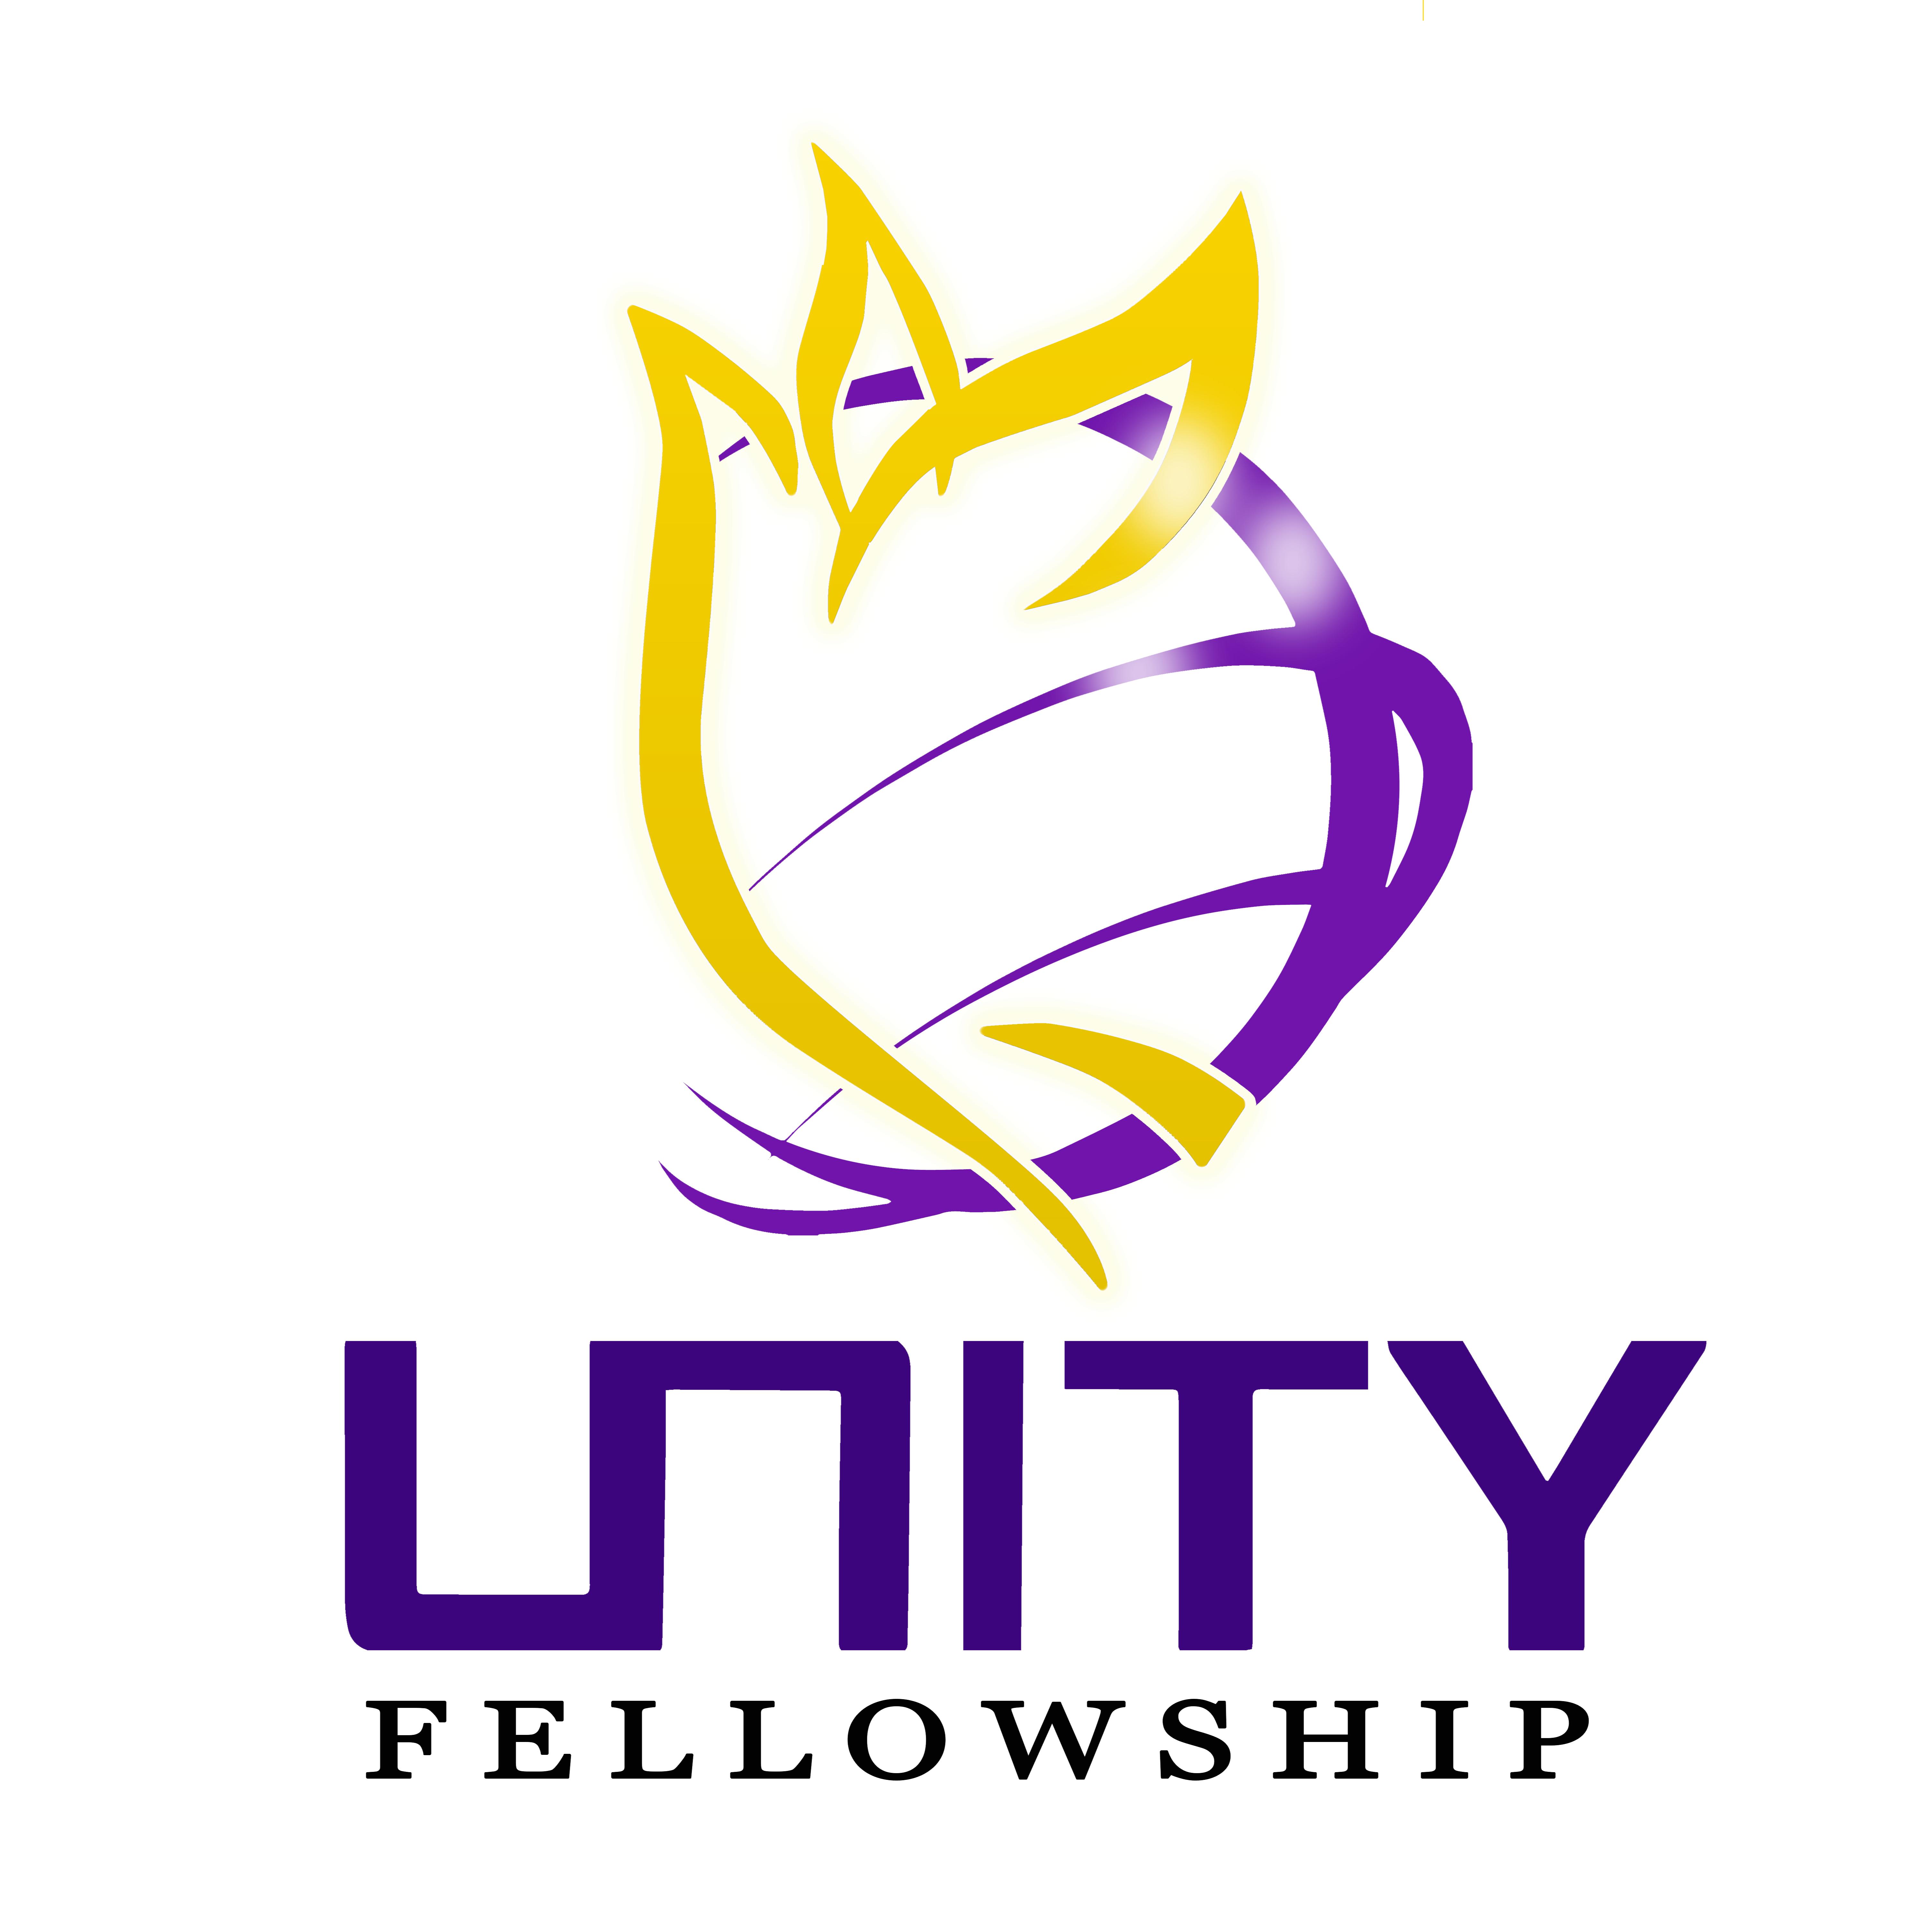 The Unity Fellowship